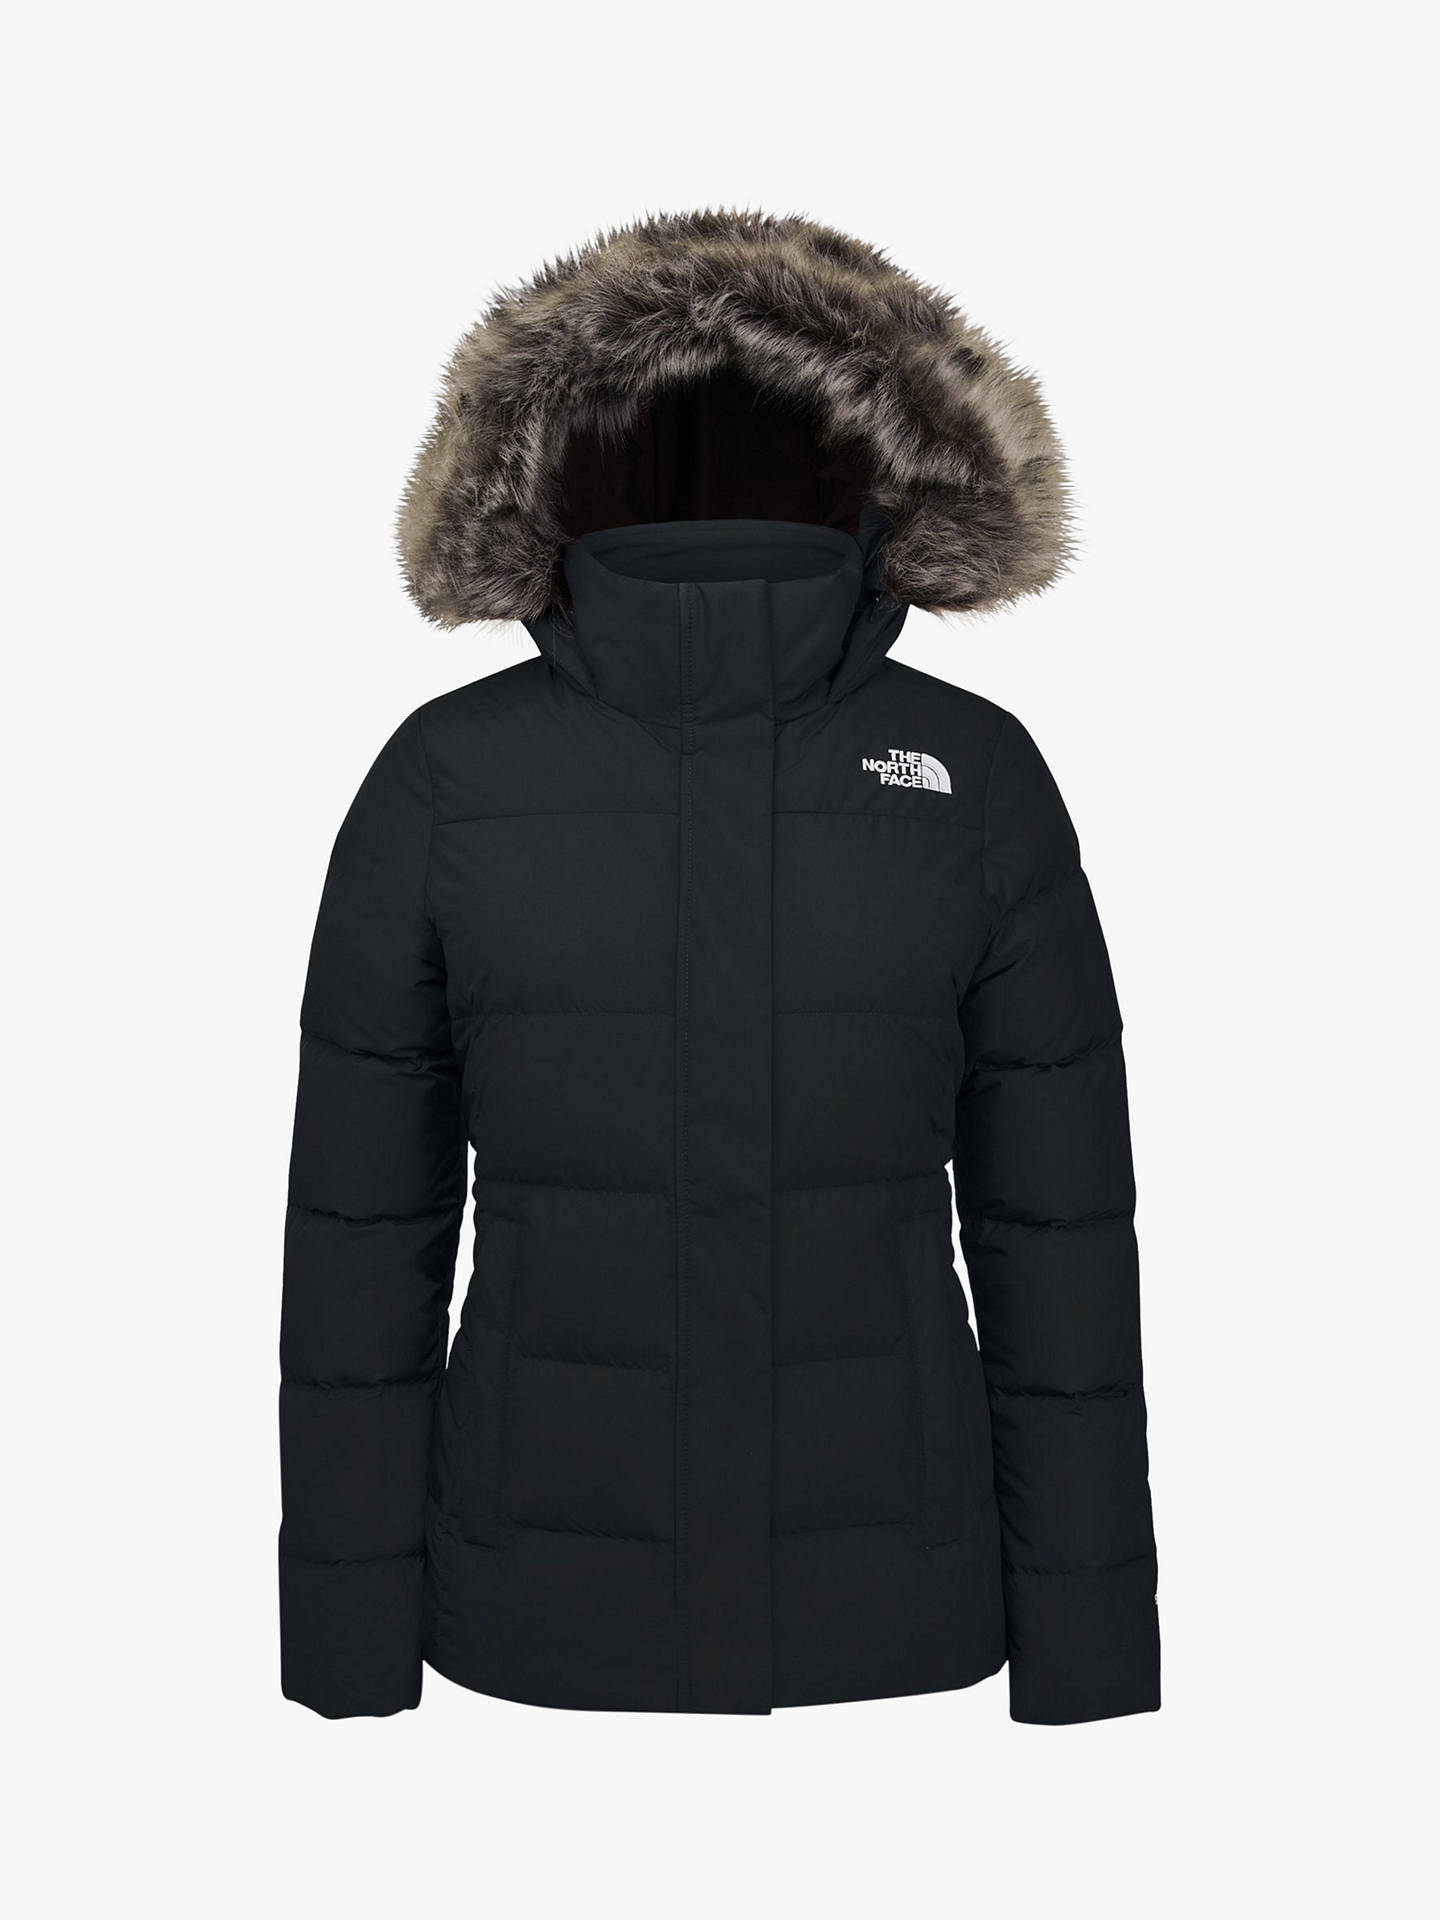 8c71b7c59 The North Face Gotham Women's Jacket, Black